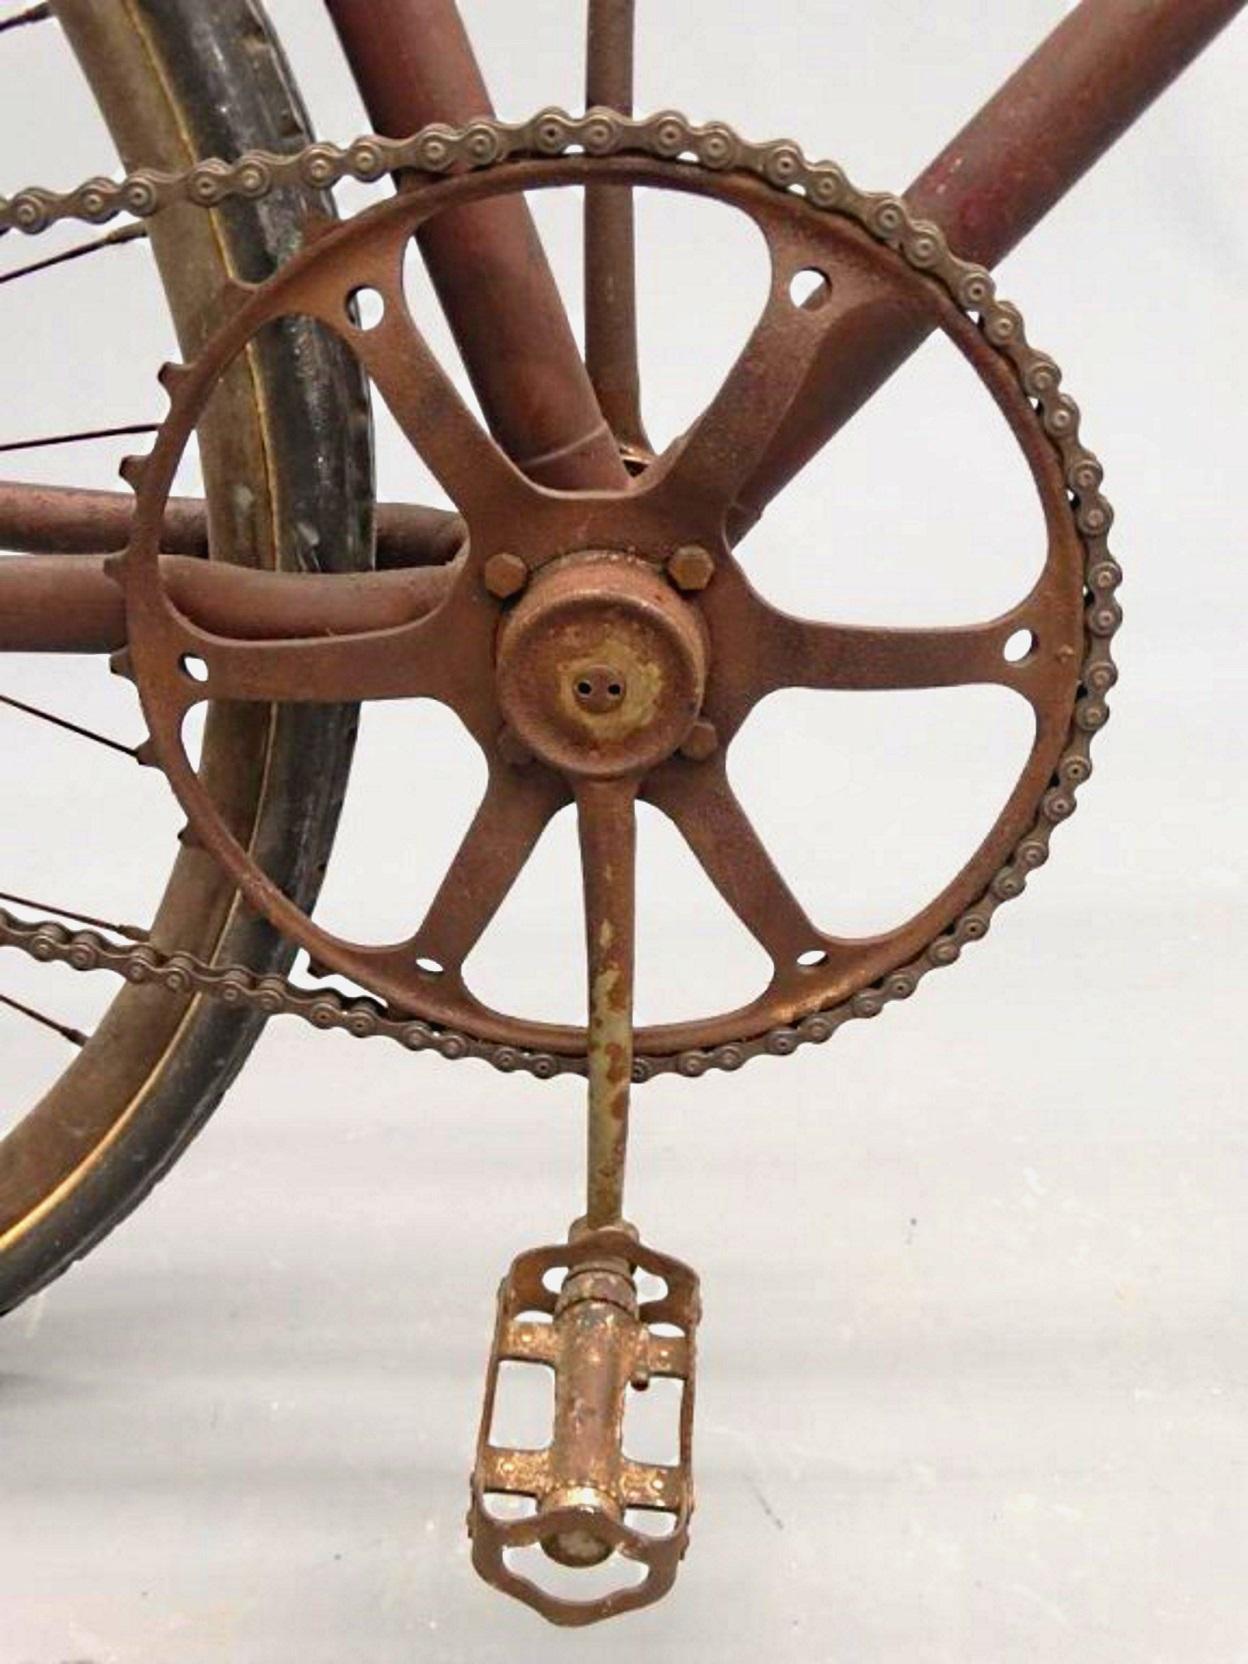 1899 racycle narrow pedals.jpg